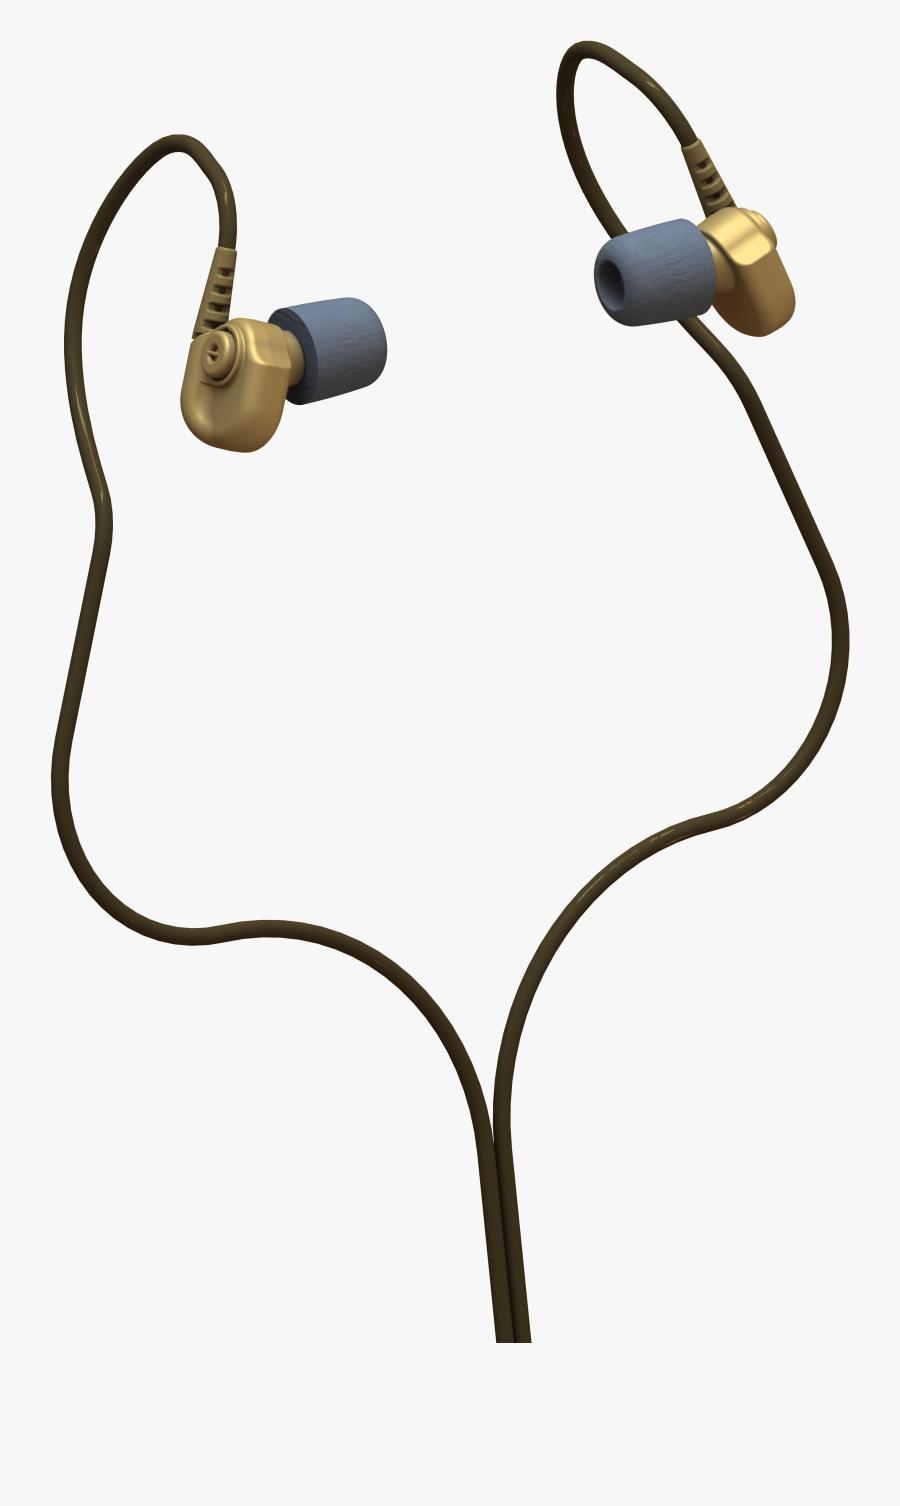 Headphone Clipart Radio Headphone - Headphones, Transparent Clipart